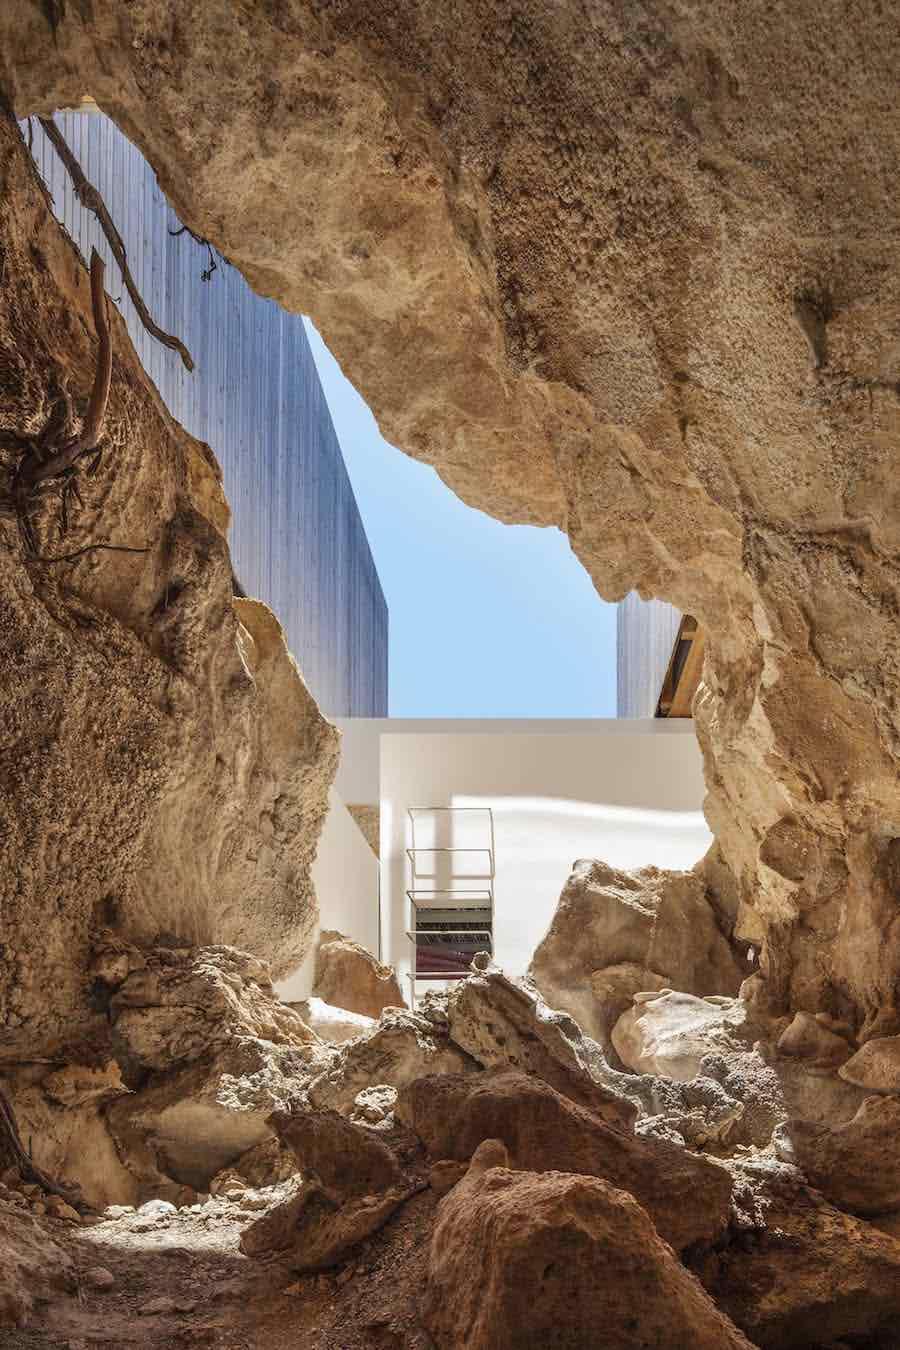 Island Mirage villa by Marià Castelló Architecture - Photo by Marià Castelló Martínez.